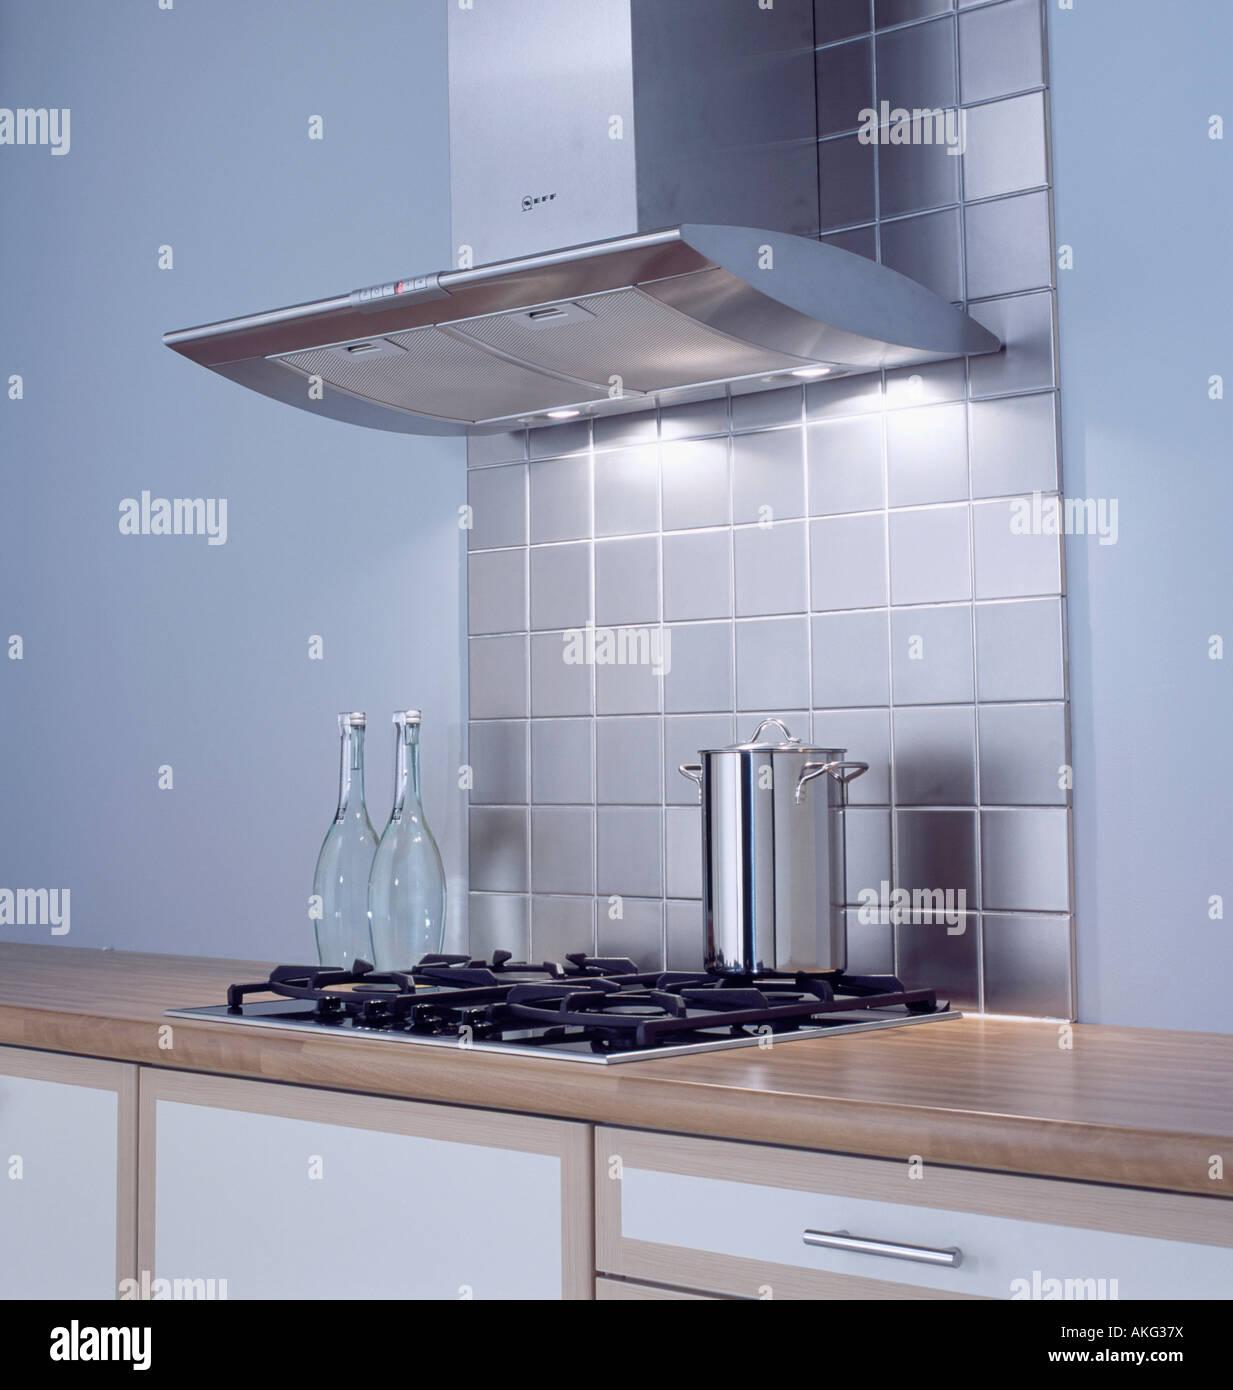 Stainless steel tiles below extractor fan above hob in modern kitchen stock photo royalty free - Modern kitchen below ...